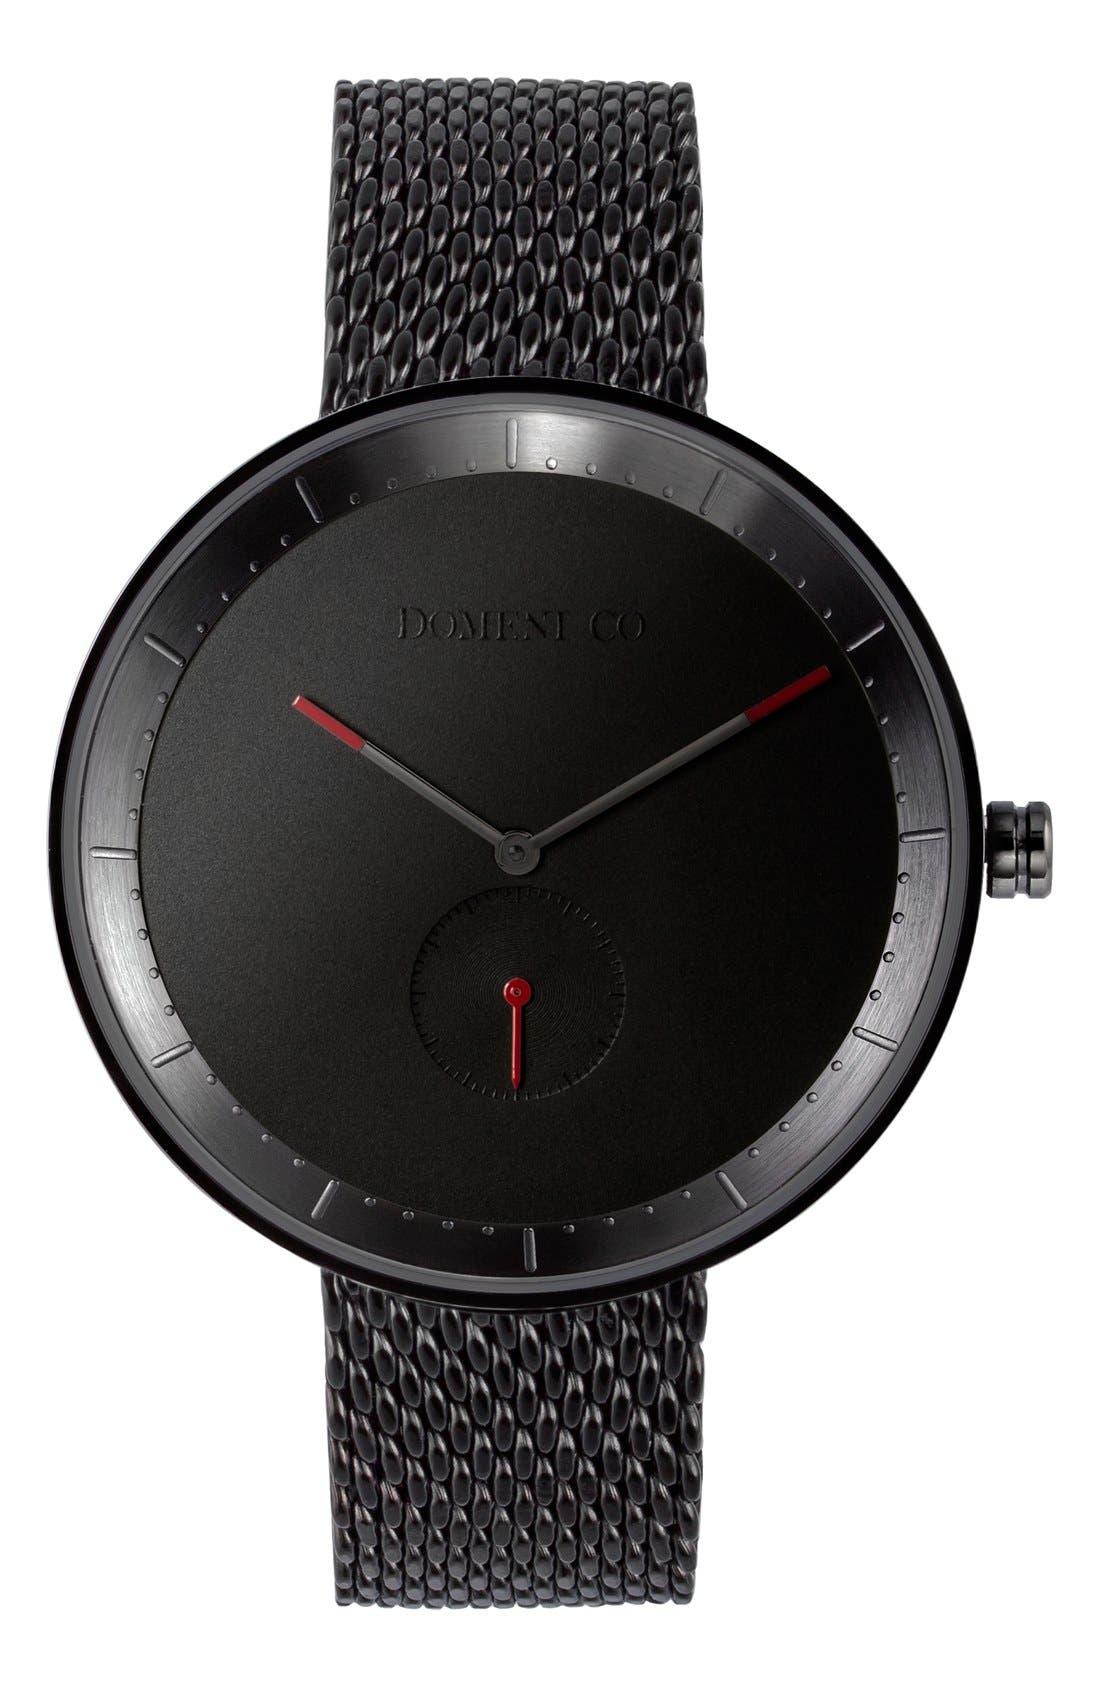 Main Image - Domeni 'Signature' Mesh Strap Watch, 40mm